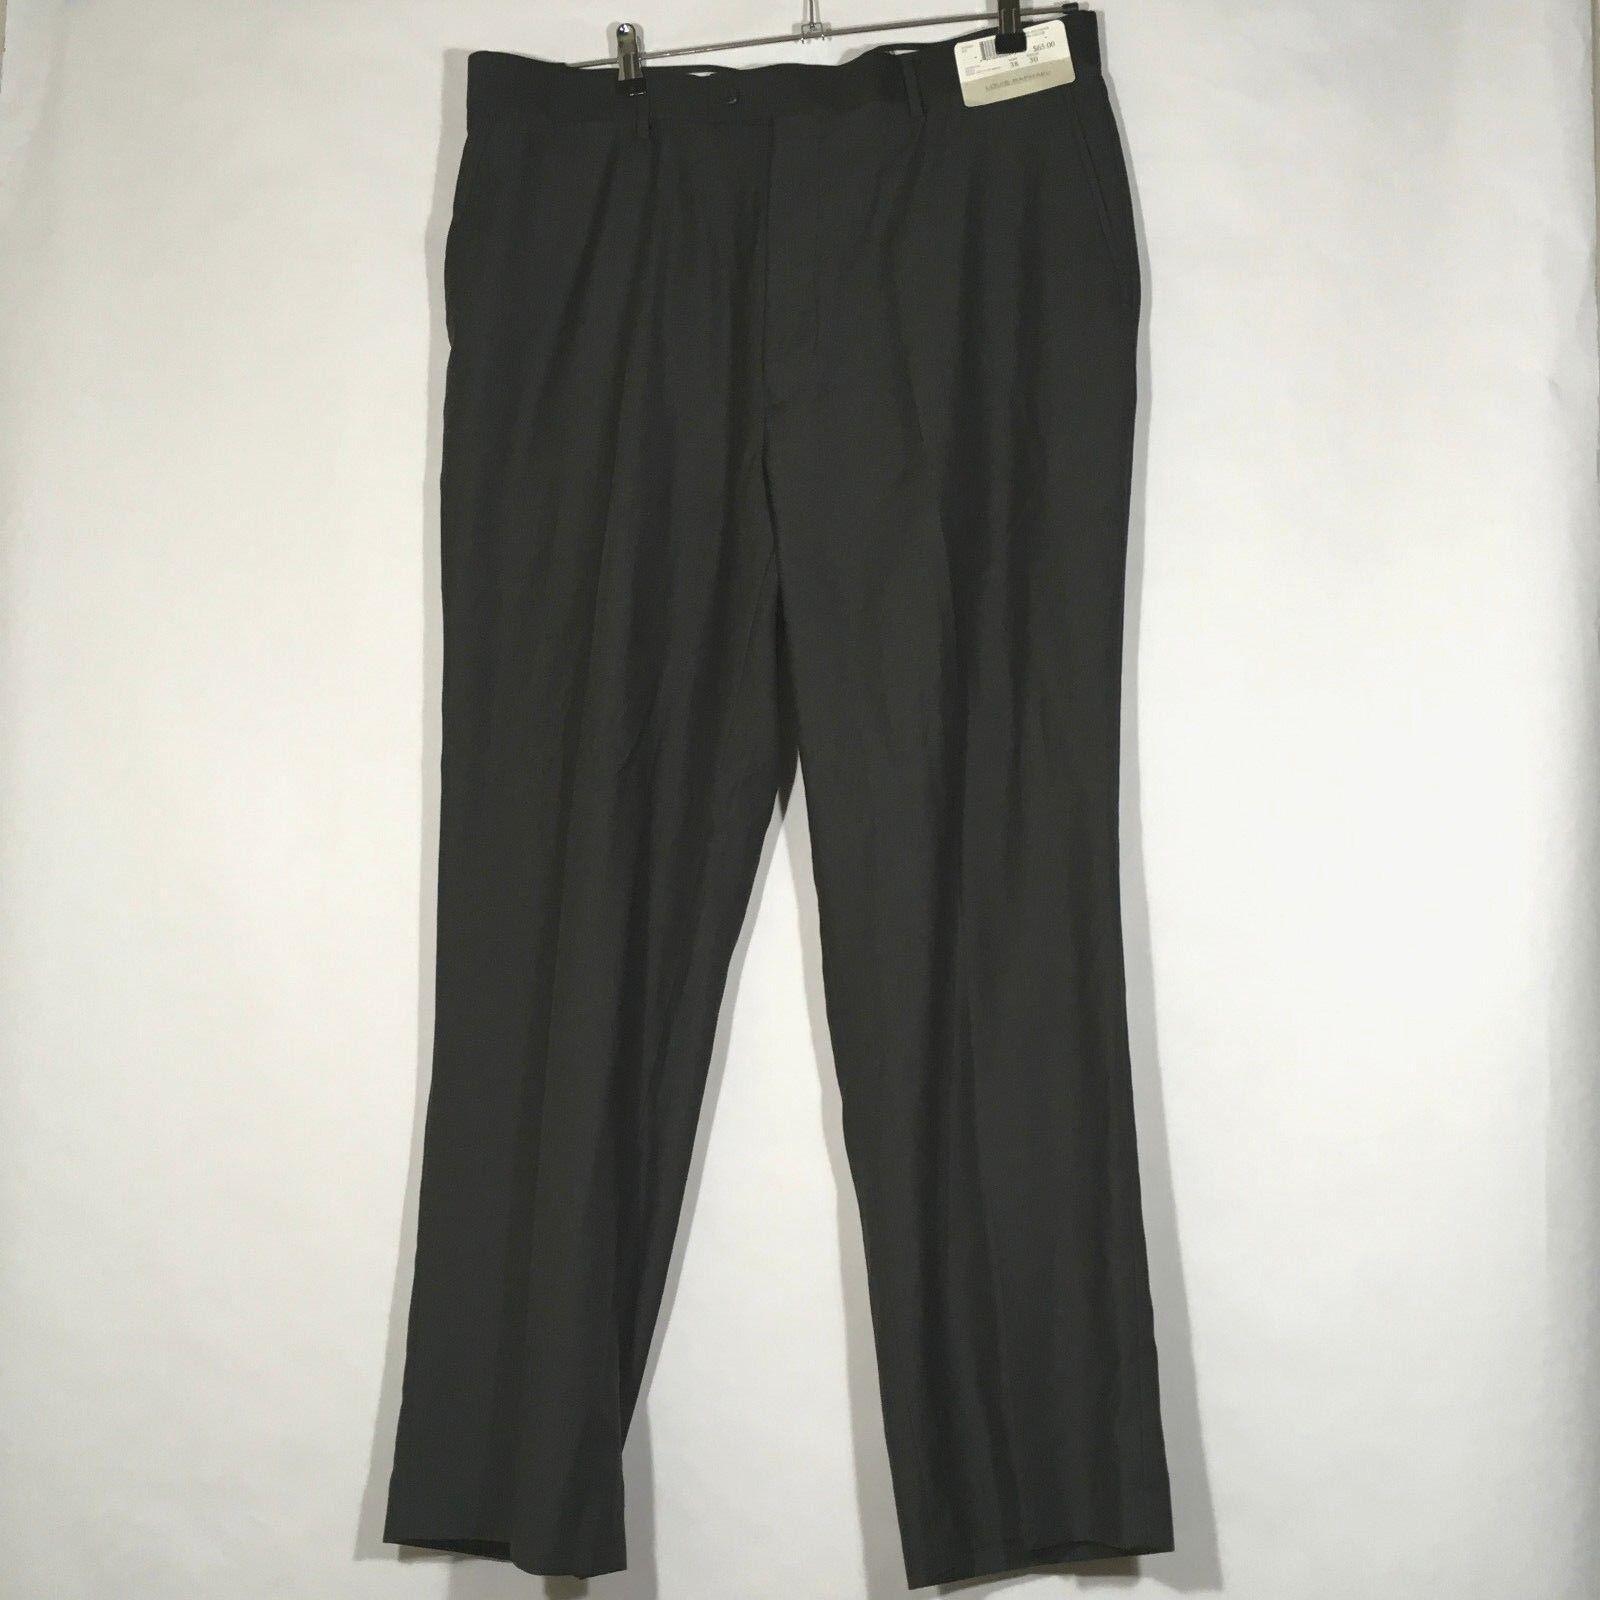 NEW Louis Raphael Tailored Charcoal Monte  Dress Pants Men Straight Leg 38x31